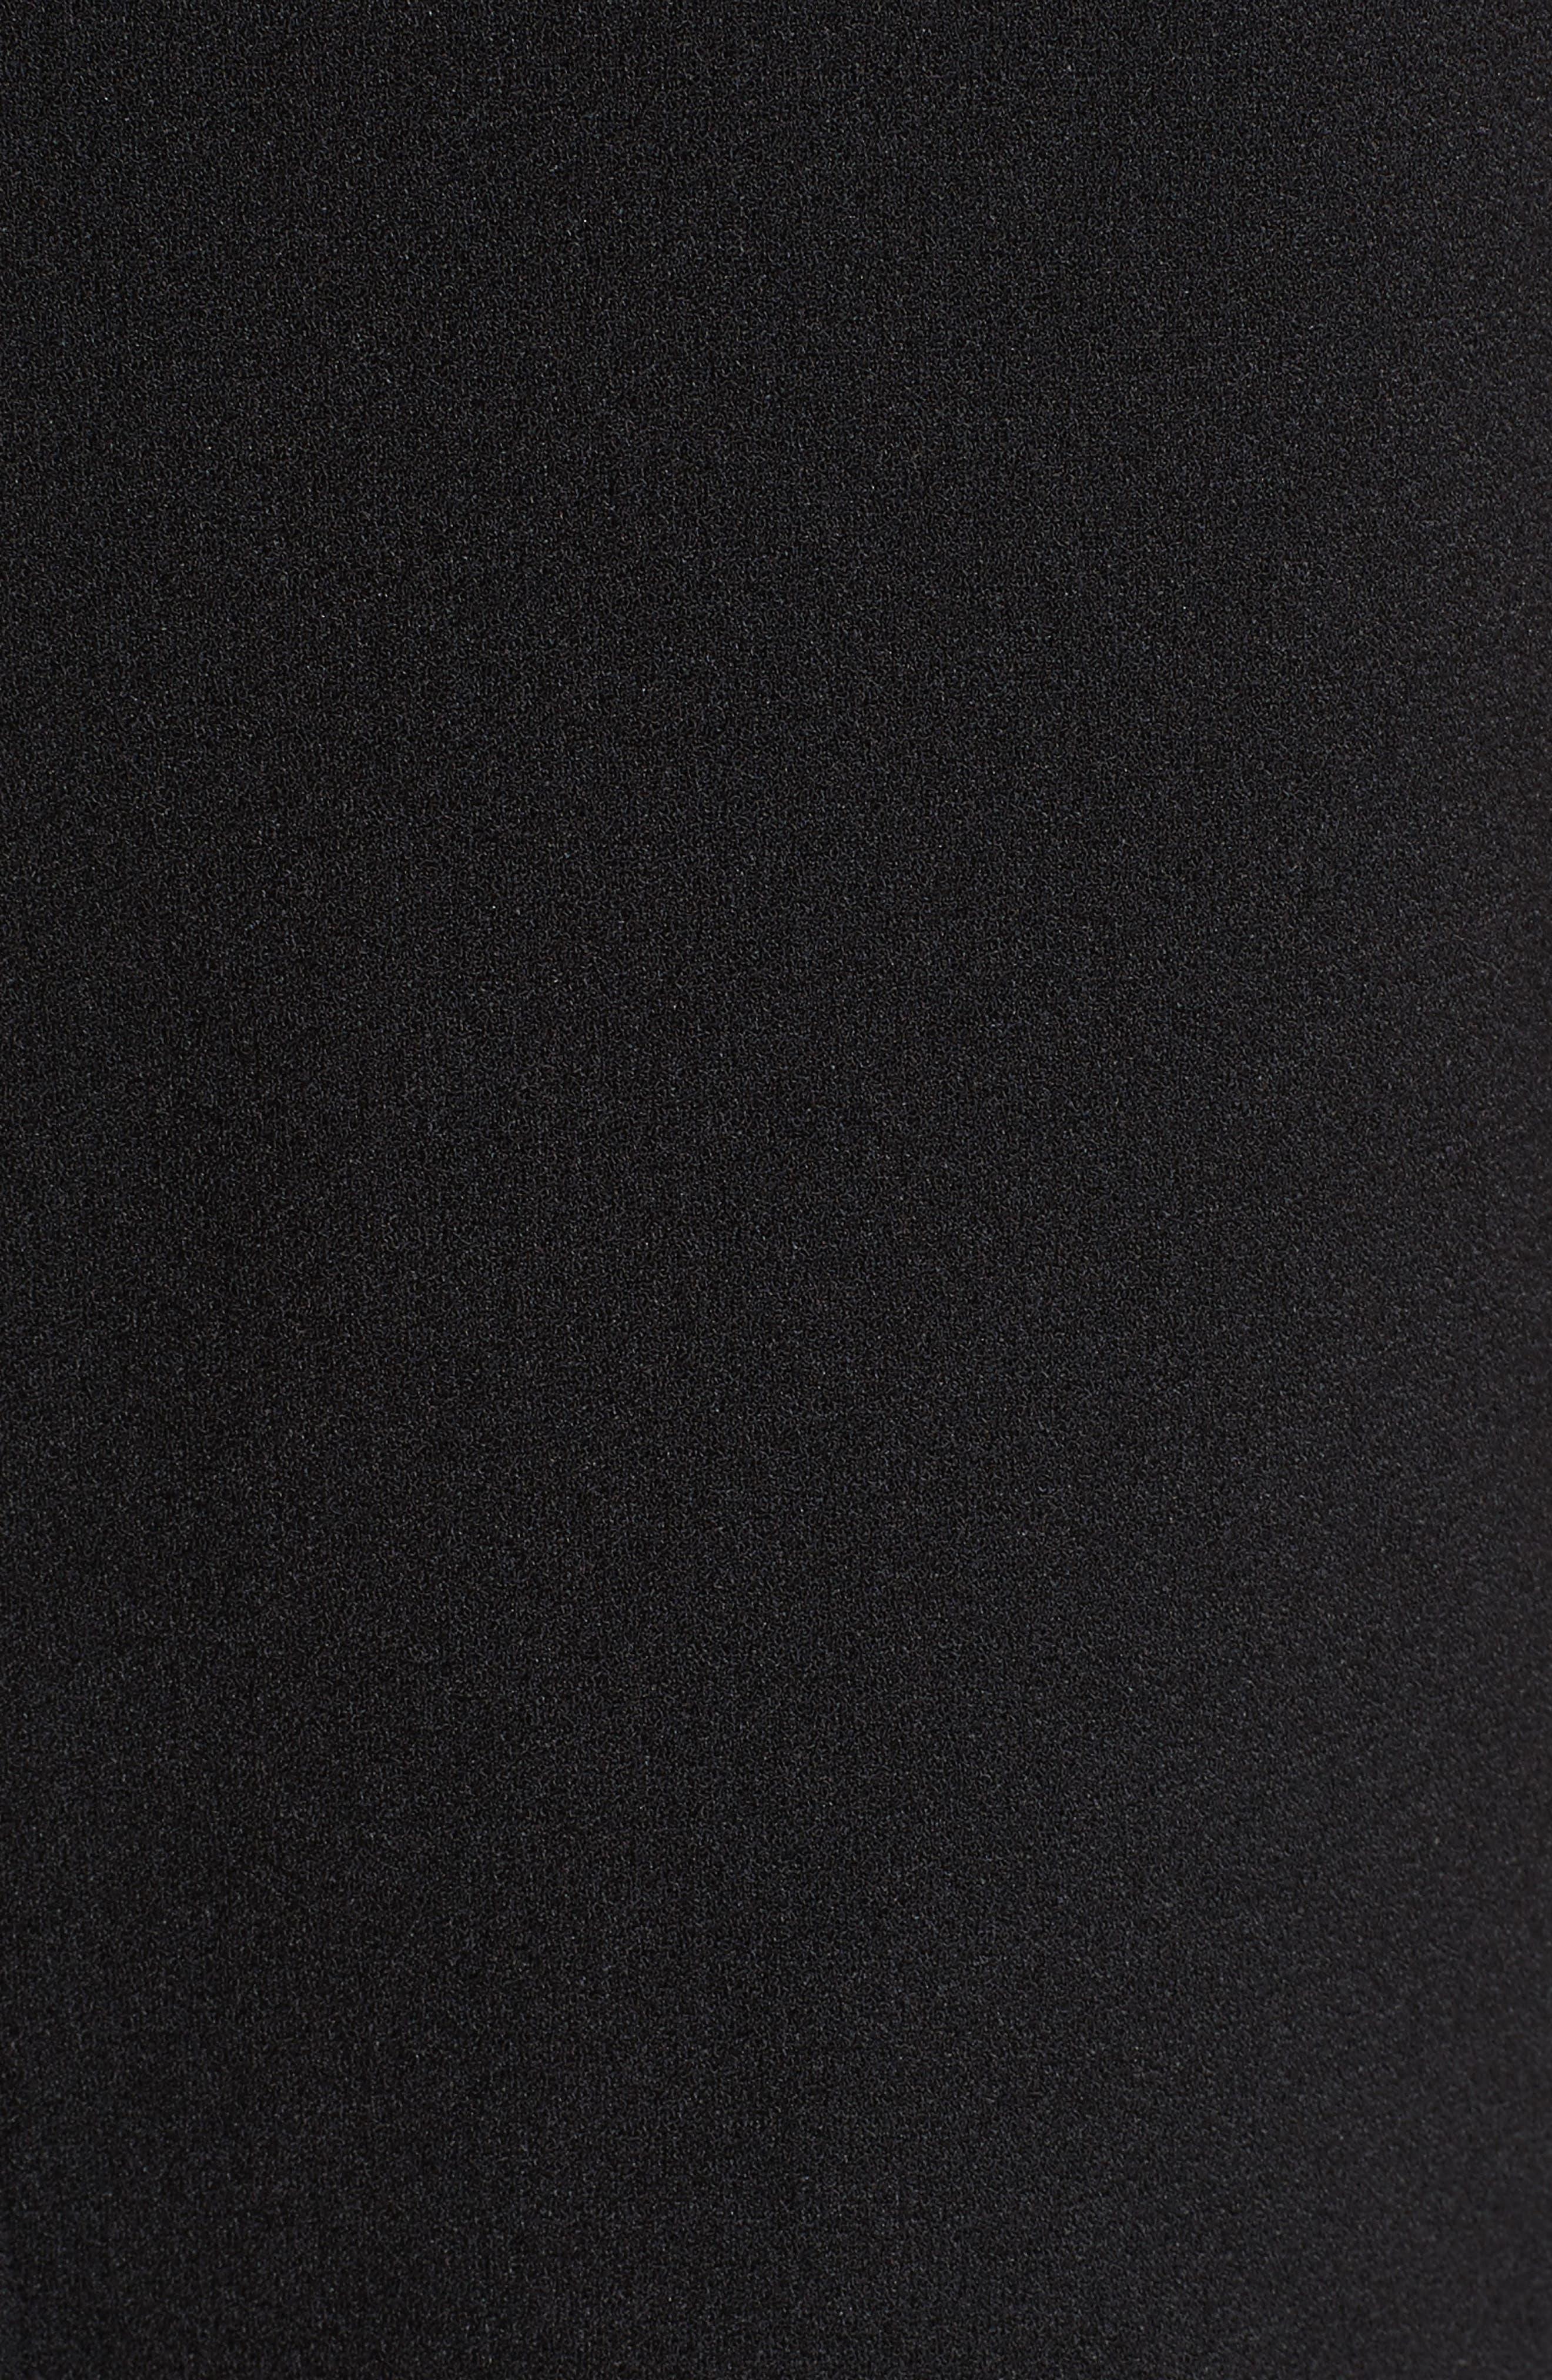 Marques'Almeida Asymmetrical Bicolor Crepe Skirt,                             Alternate thumbnail 5, color,                             003